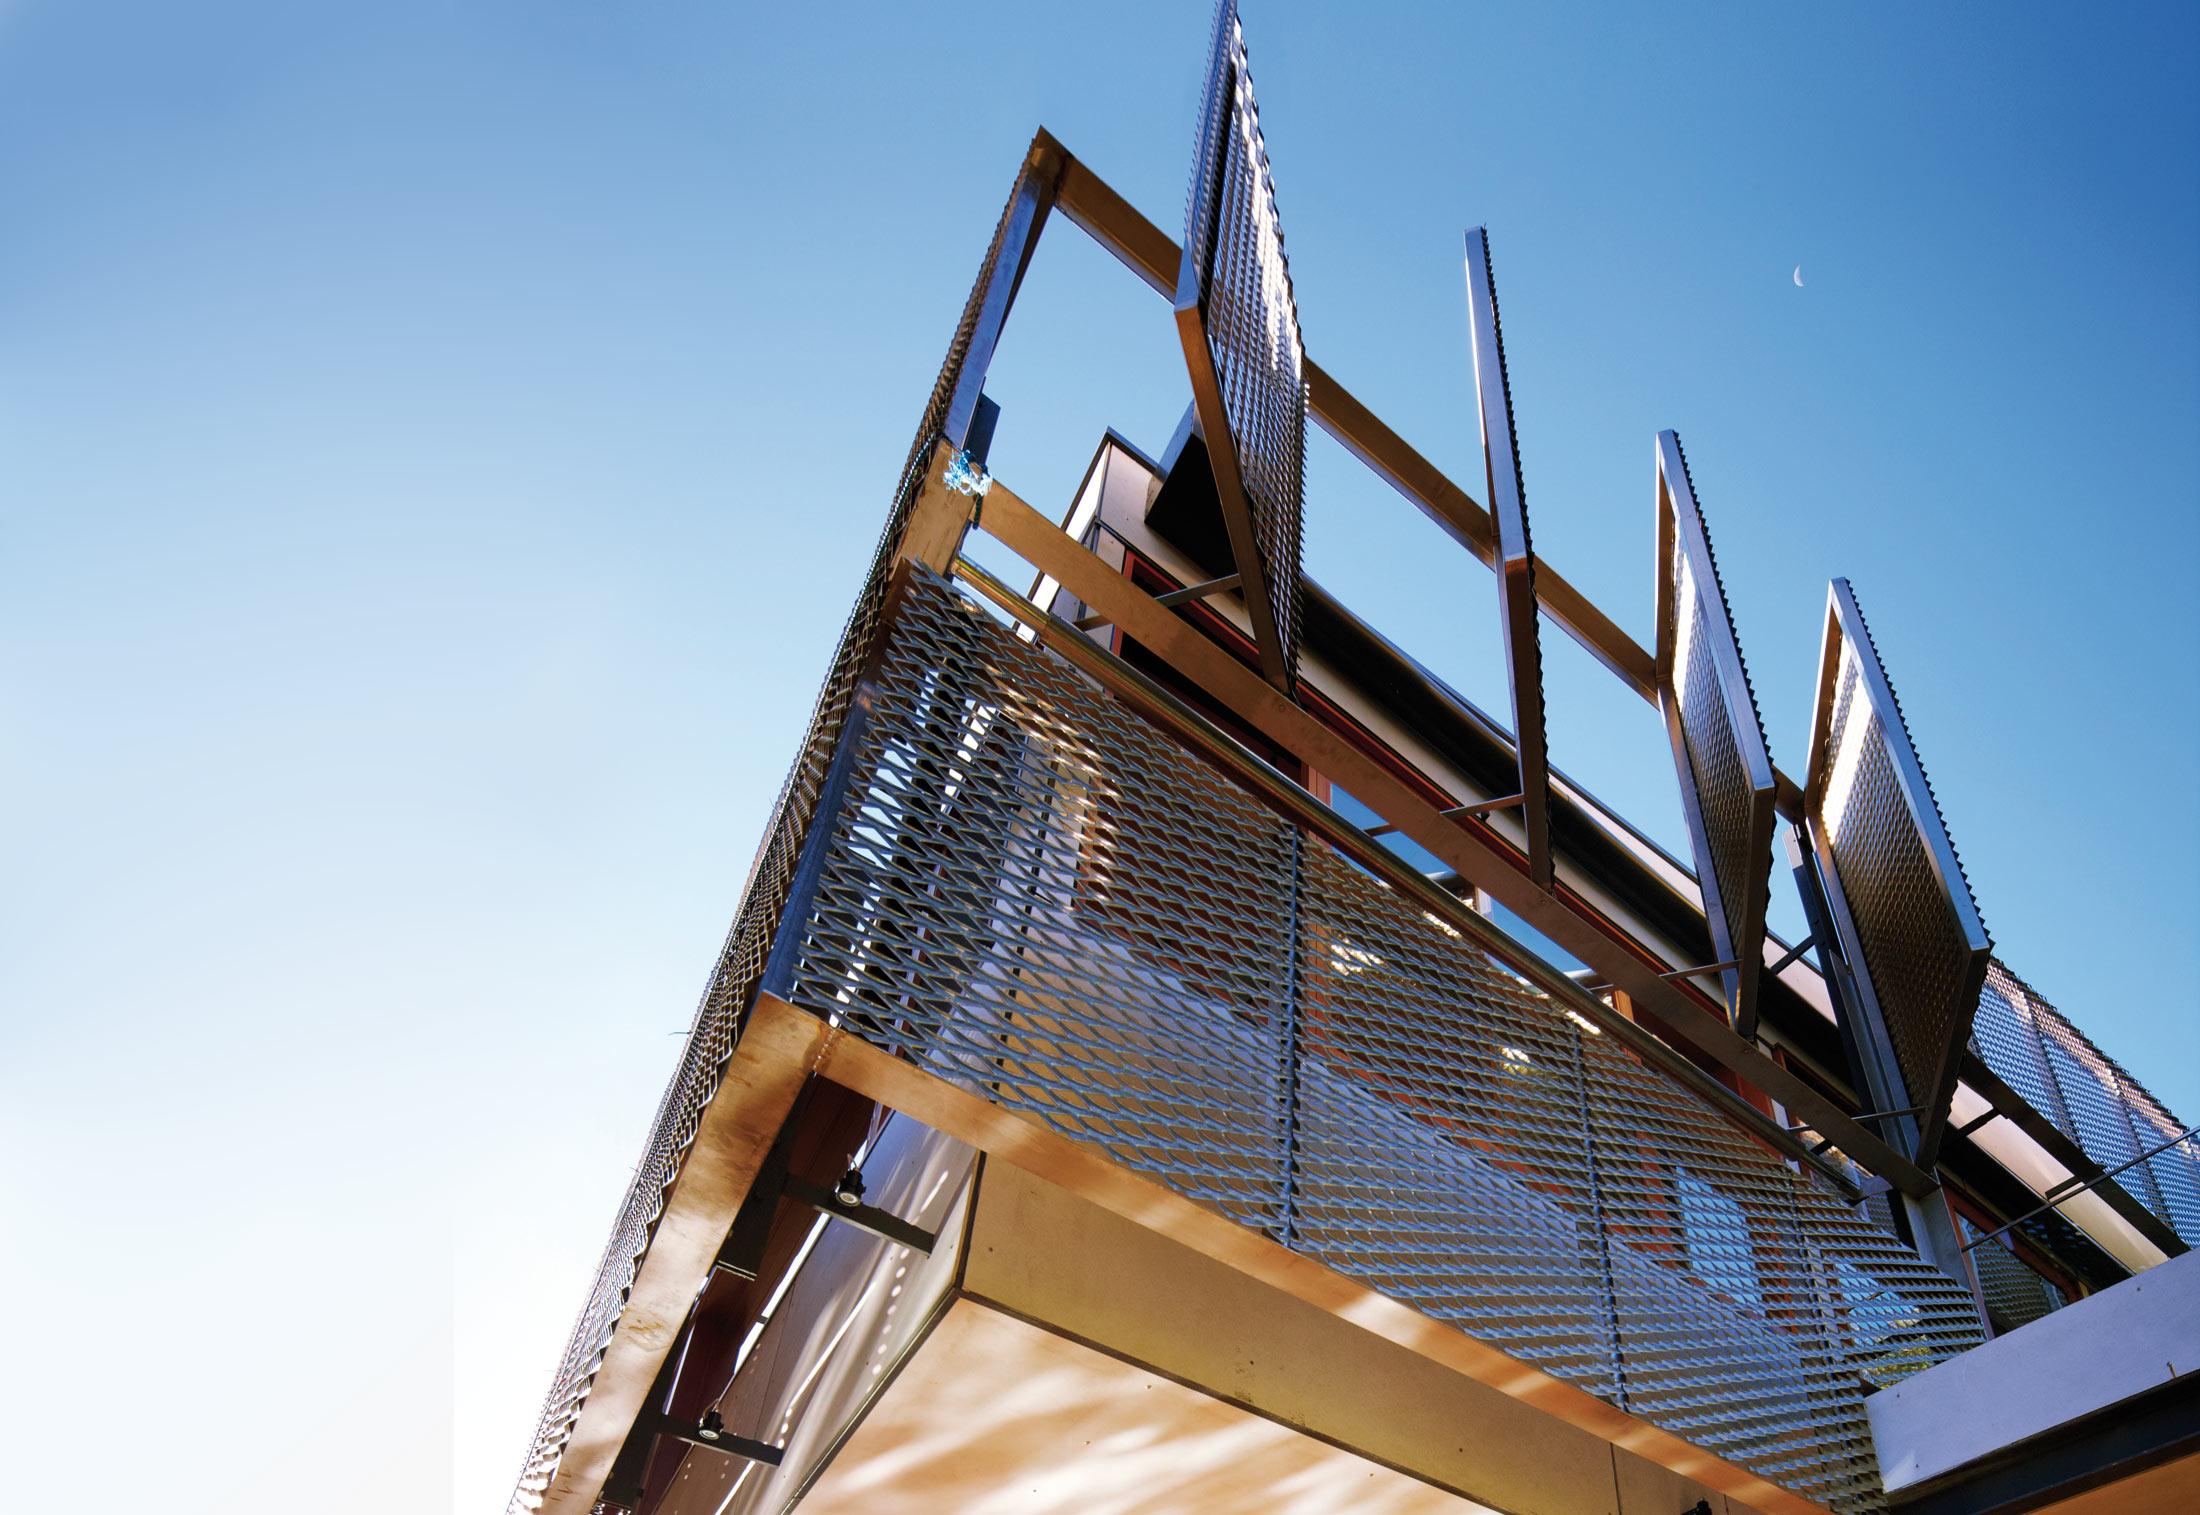 Tecu 174 Brass Mesh Solar Control By Kme Stylepark